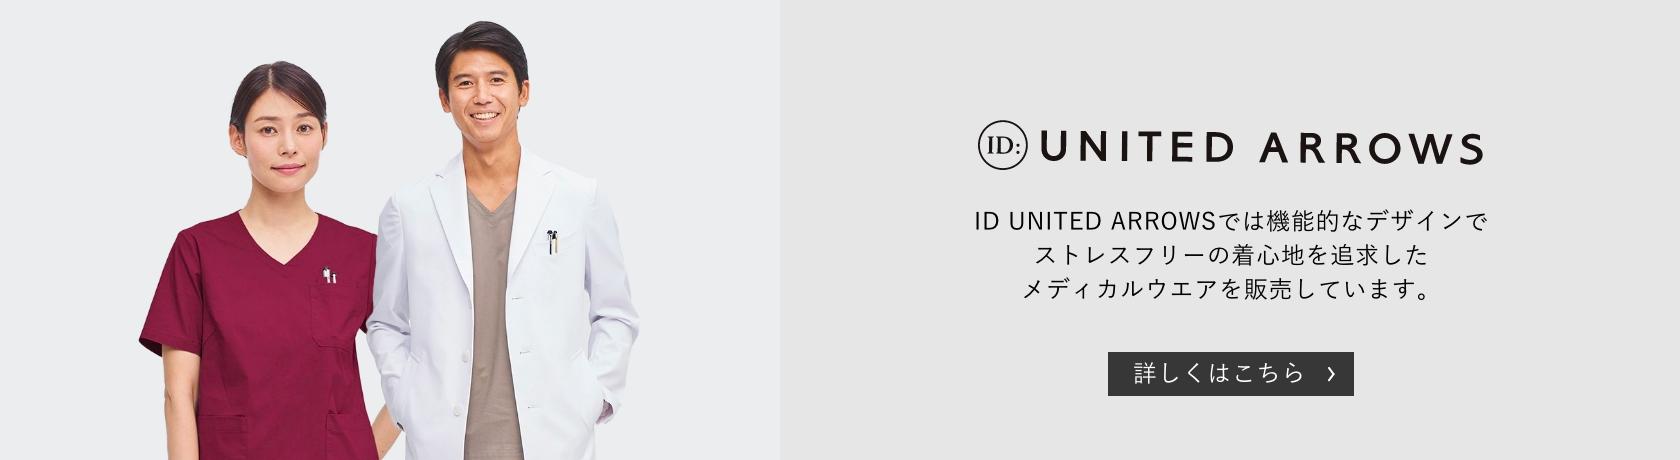 uniform UNITED ARROWS|医療用白衣スクラブ